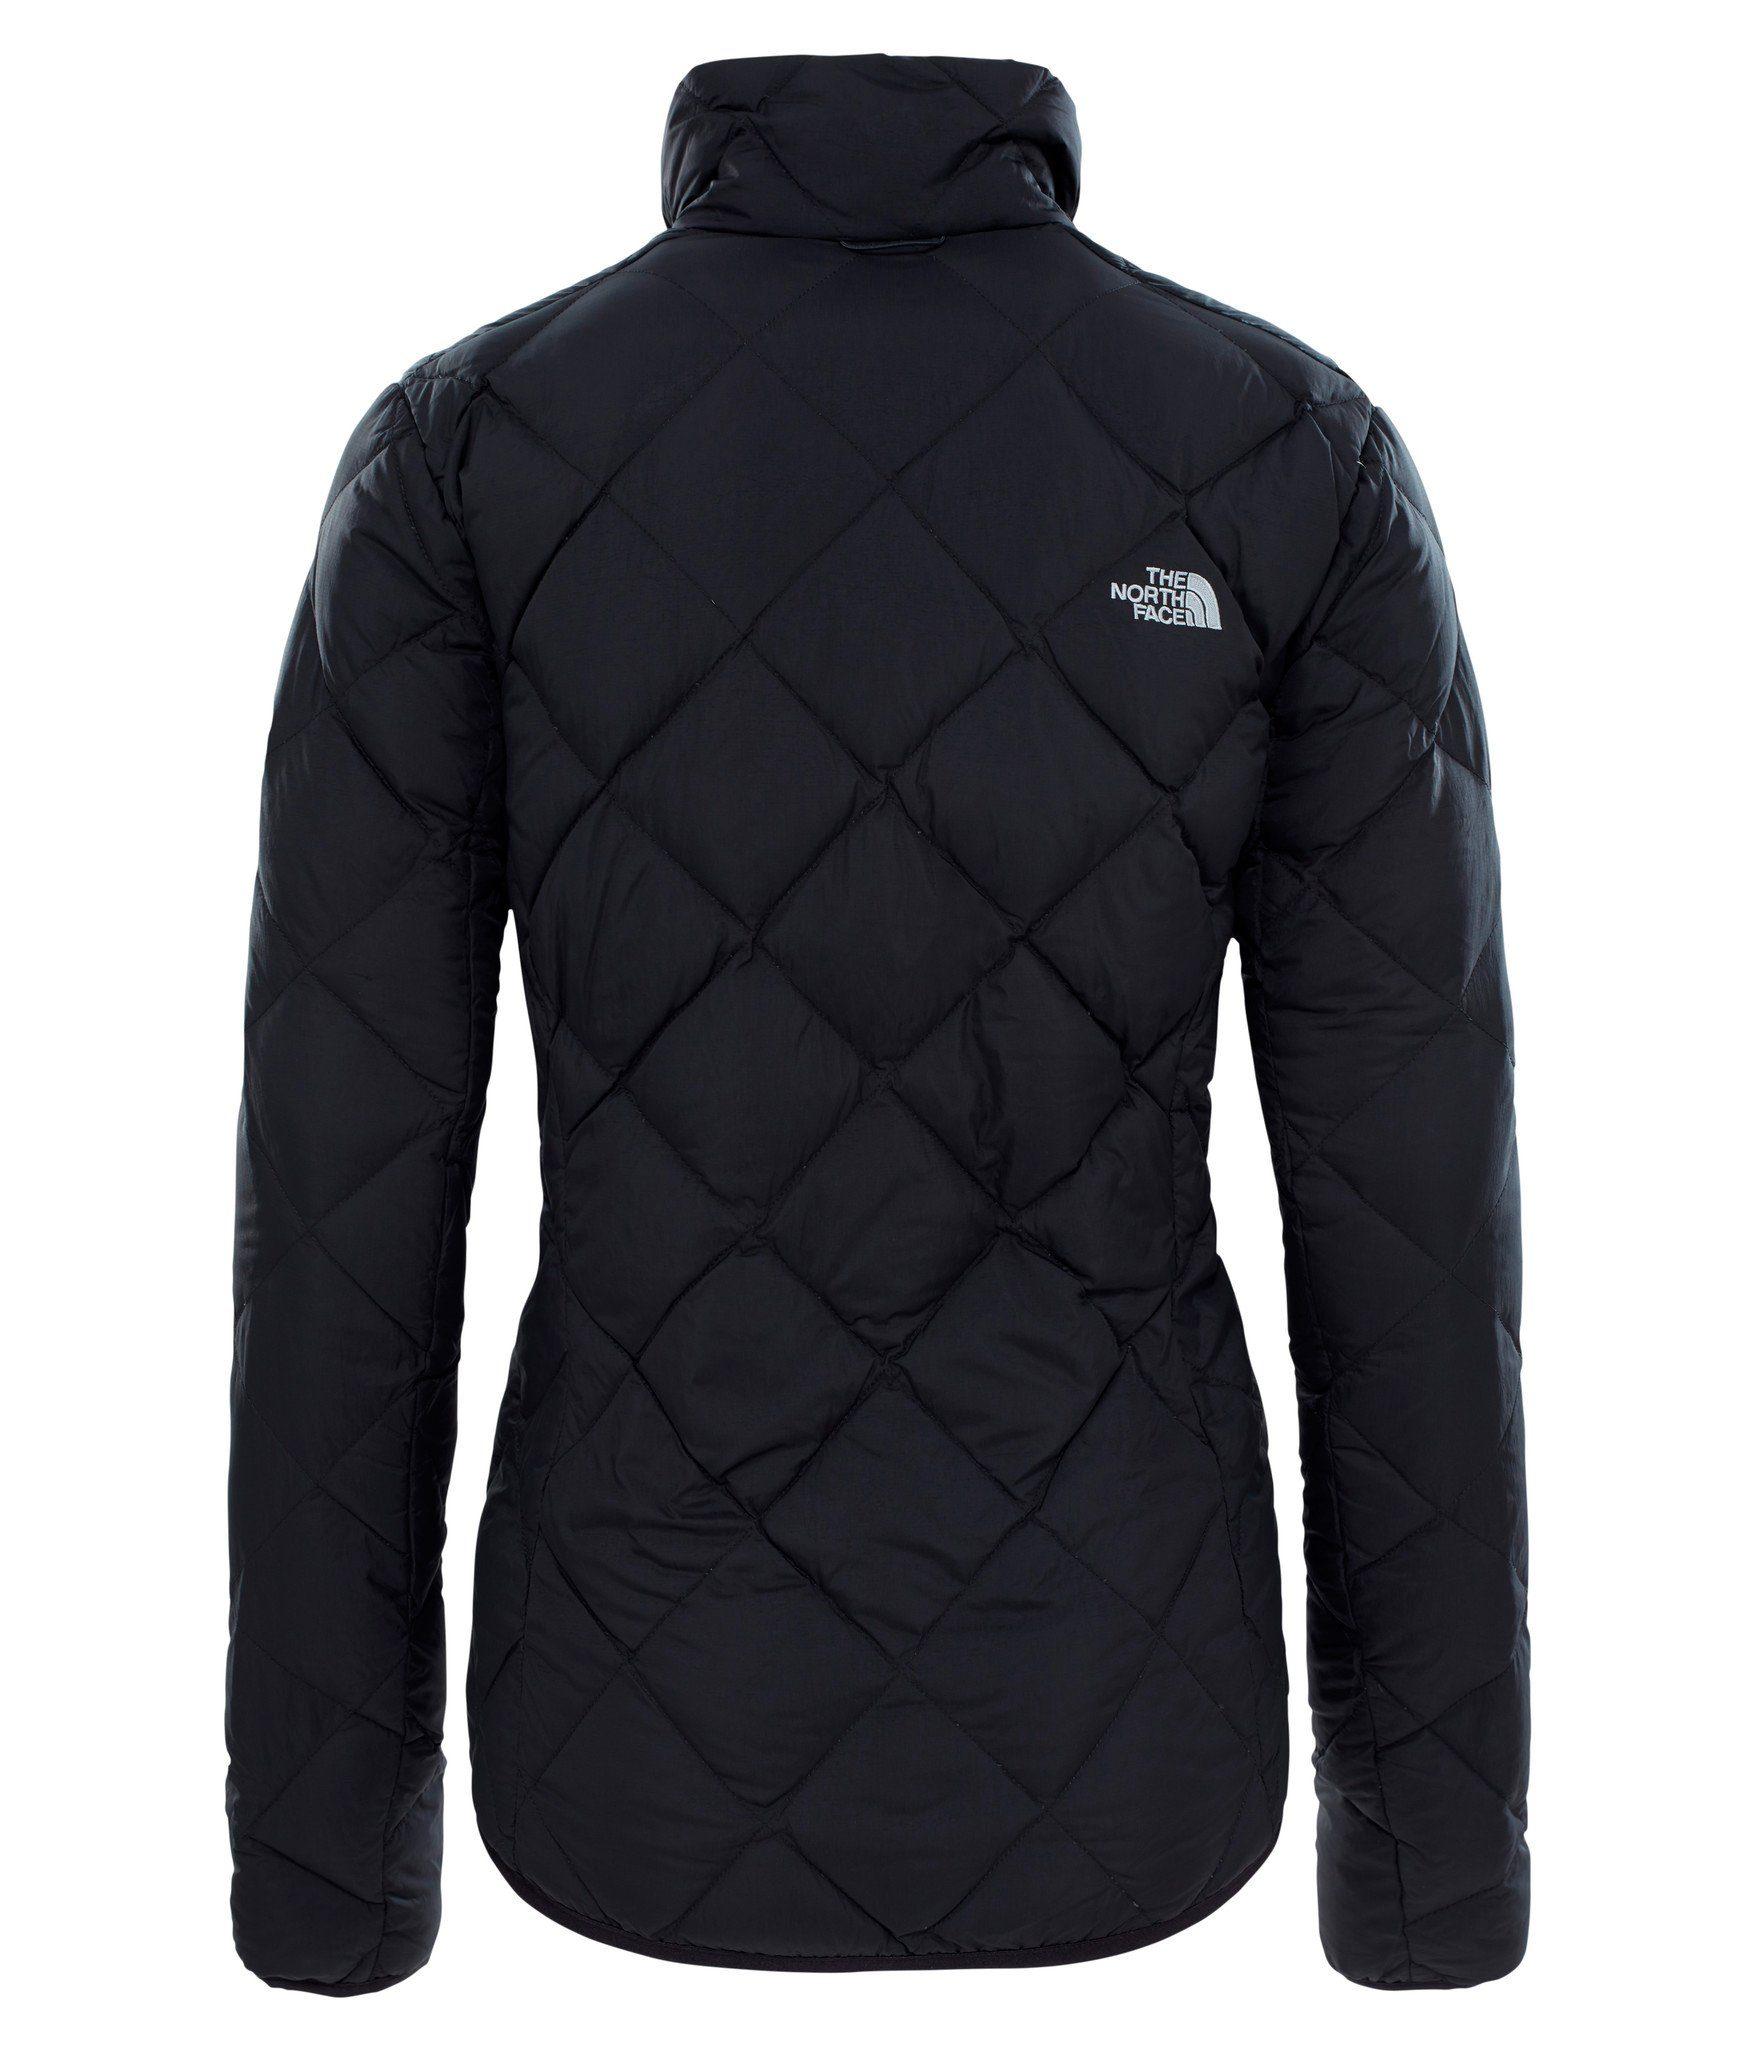 The North Face Outdoorjacke »Peakfrontier Zip-In Reversible Down Jacket Women«